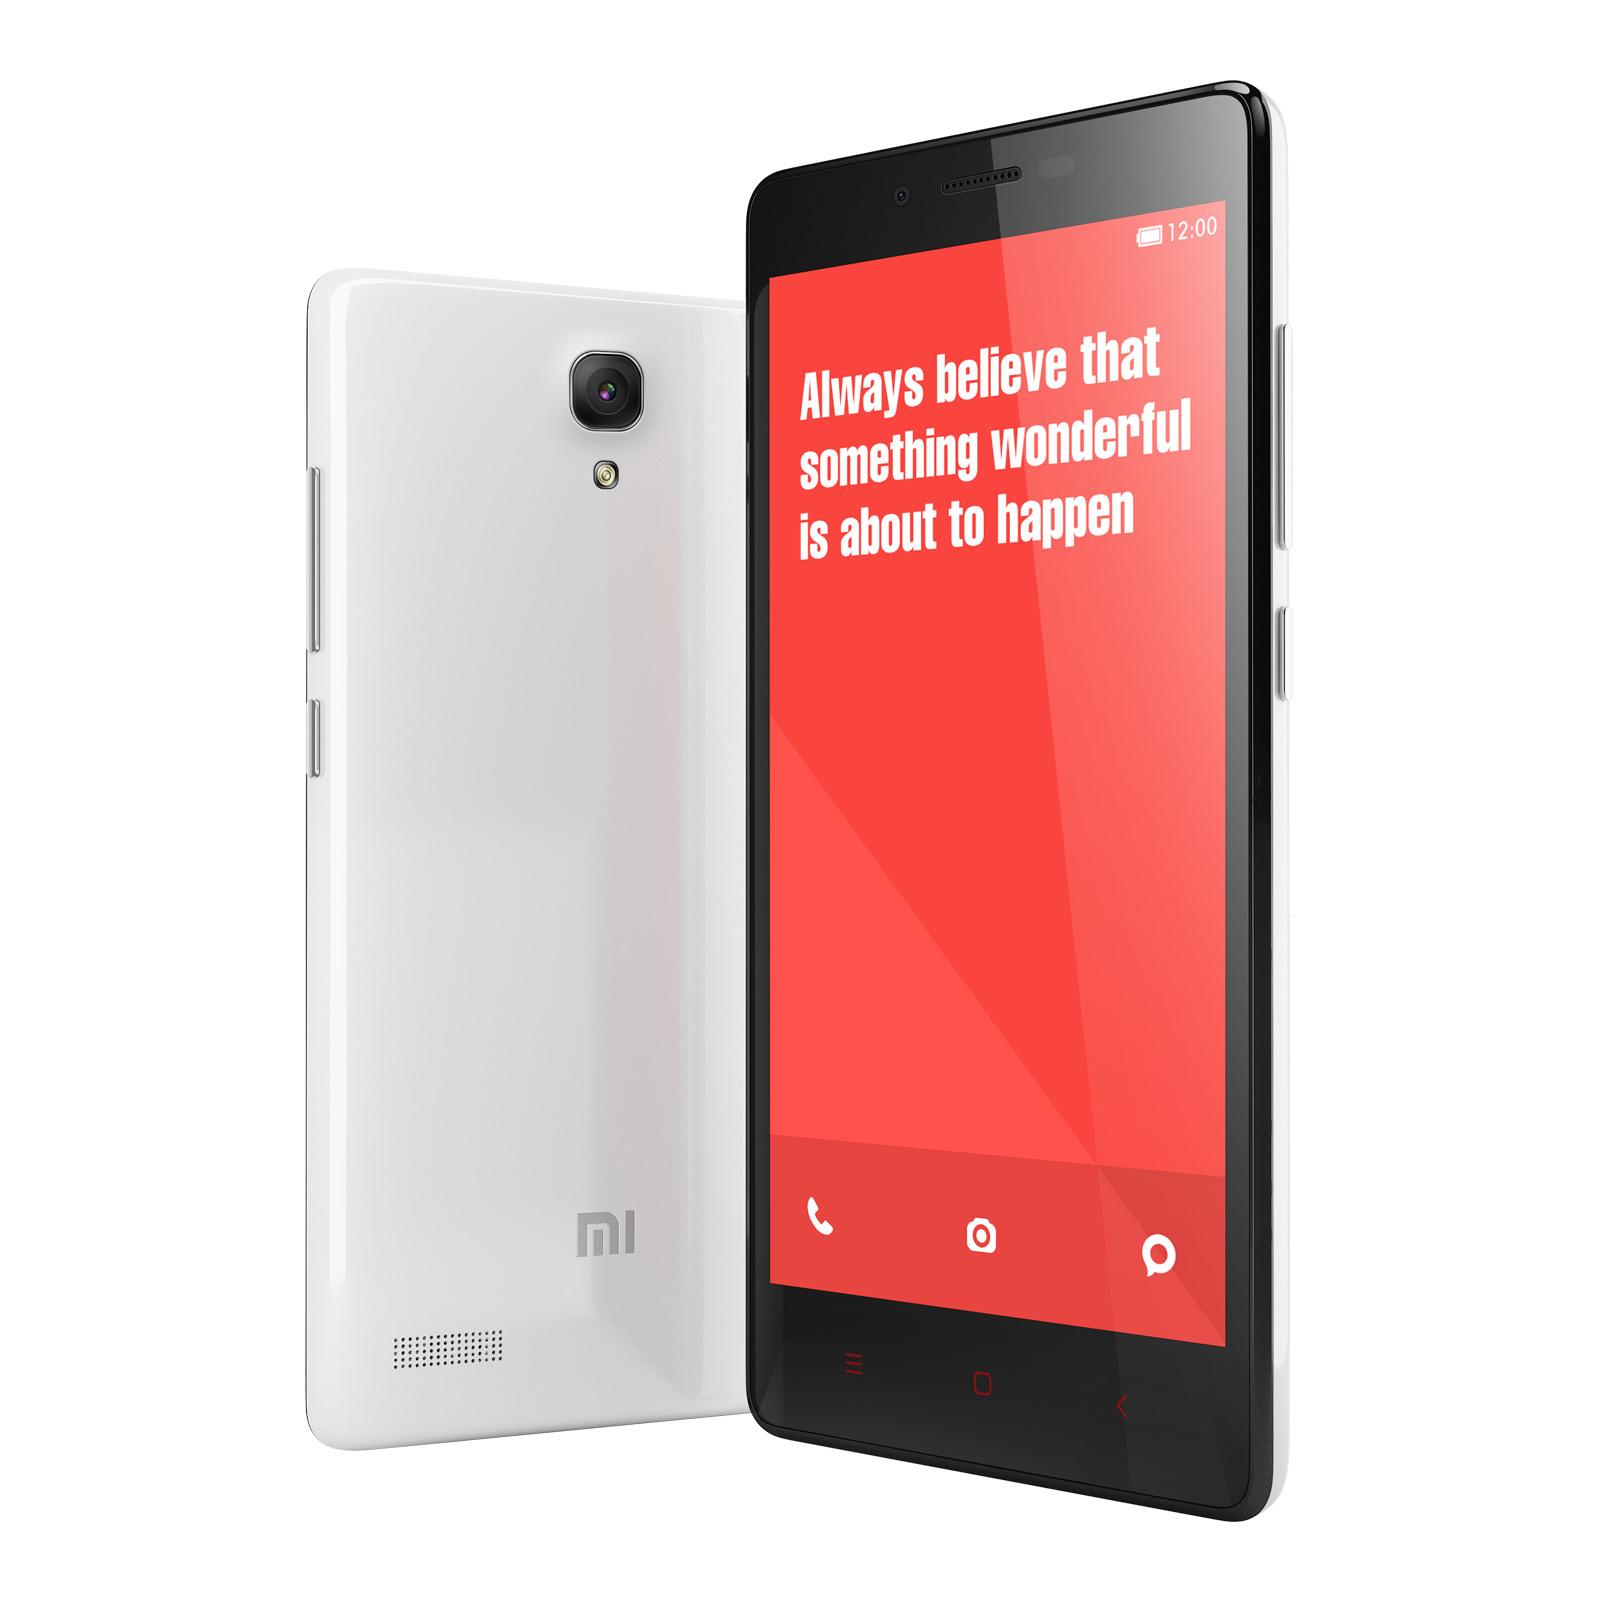 Redmi Note Prime Price Buy Online Mi India Love Mei Powerful Bumper Case Xiaomi 2 Original 100 Previous